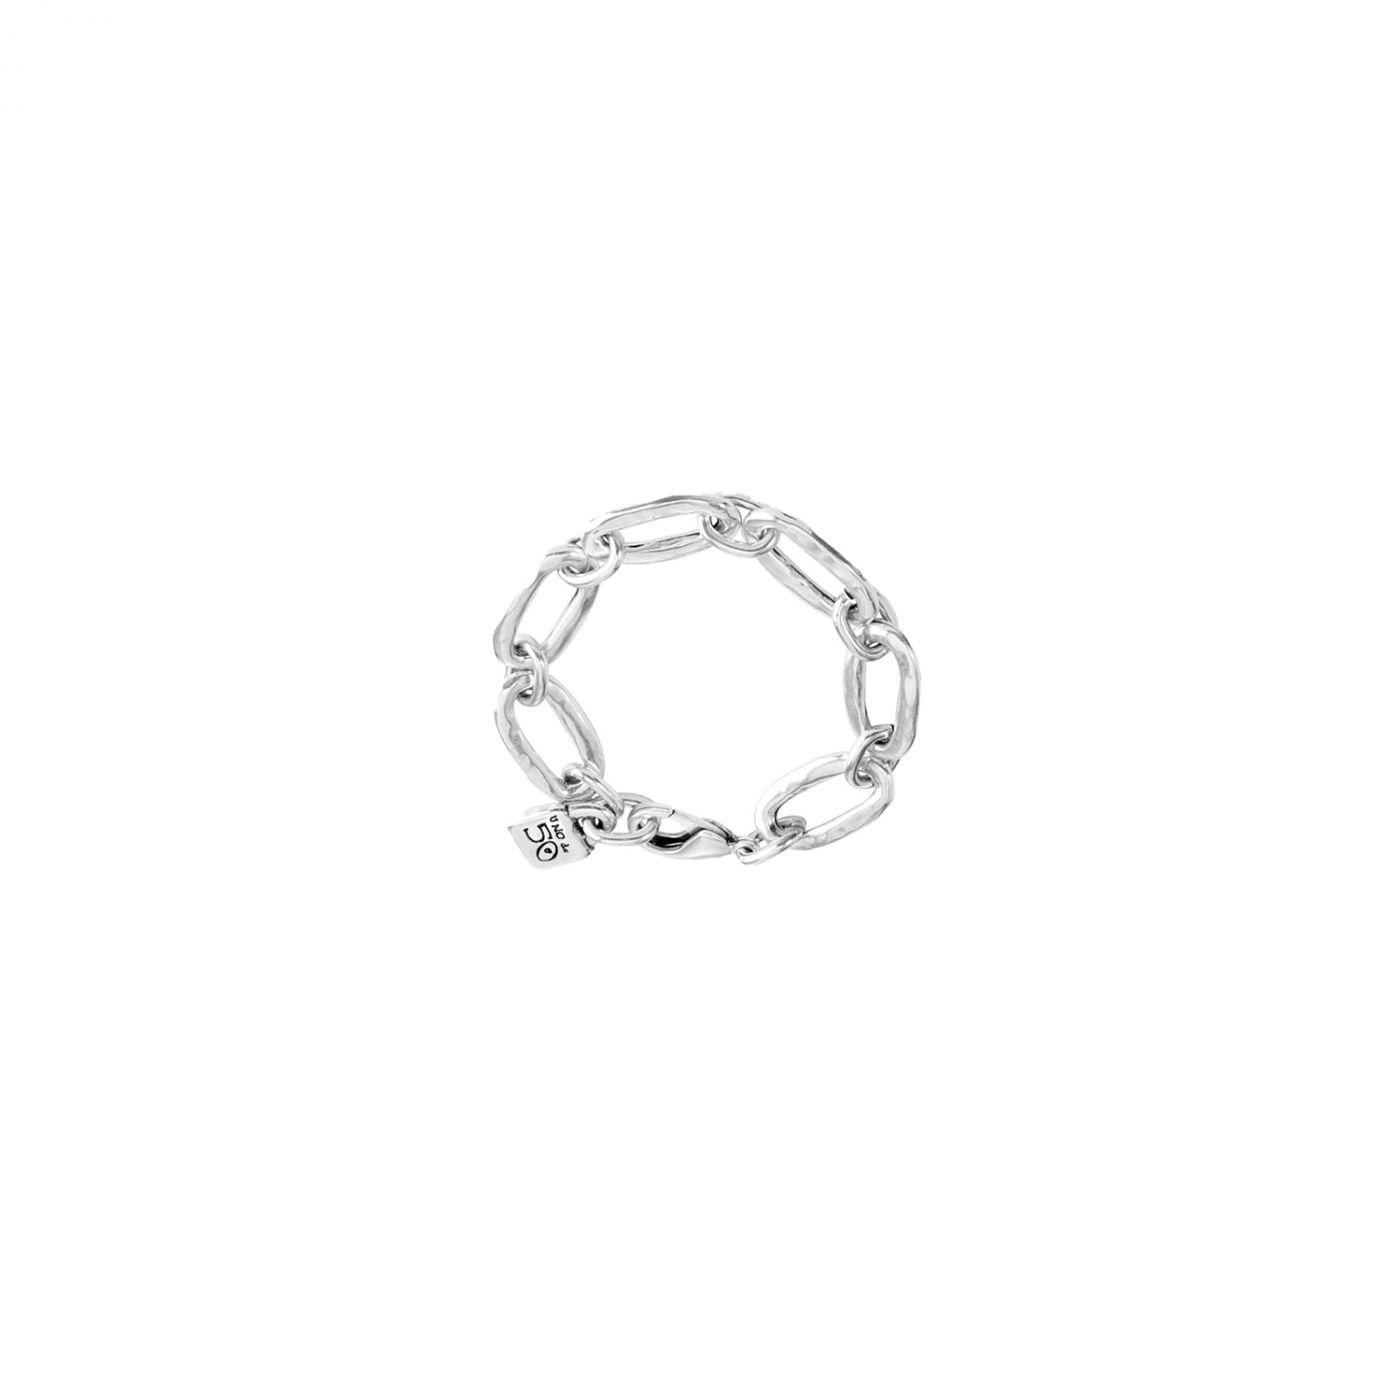 Armband, Uno de 50, Awesome, Silver